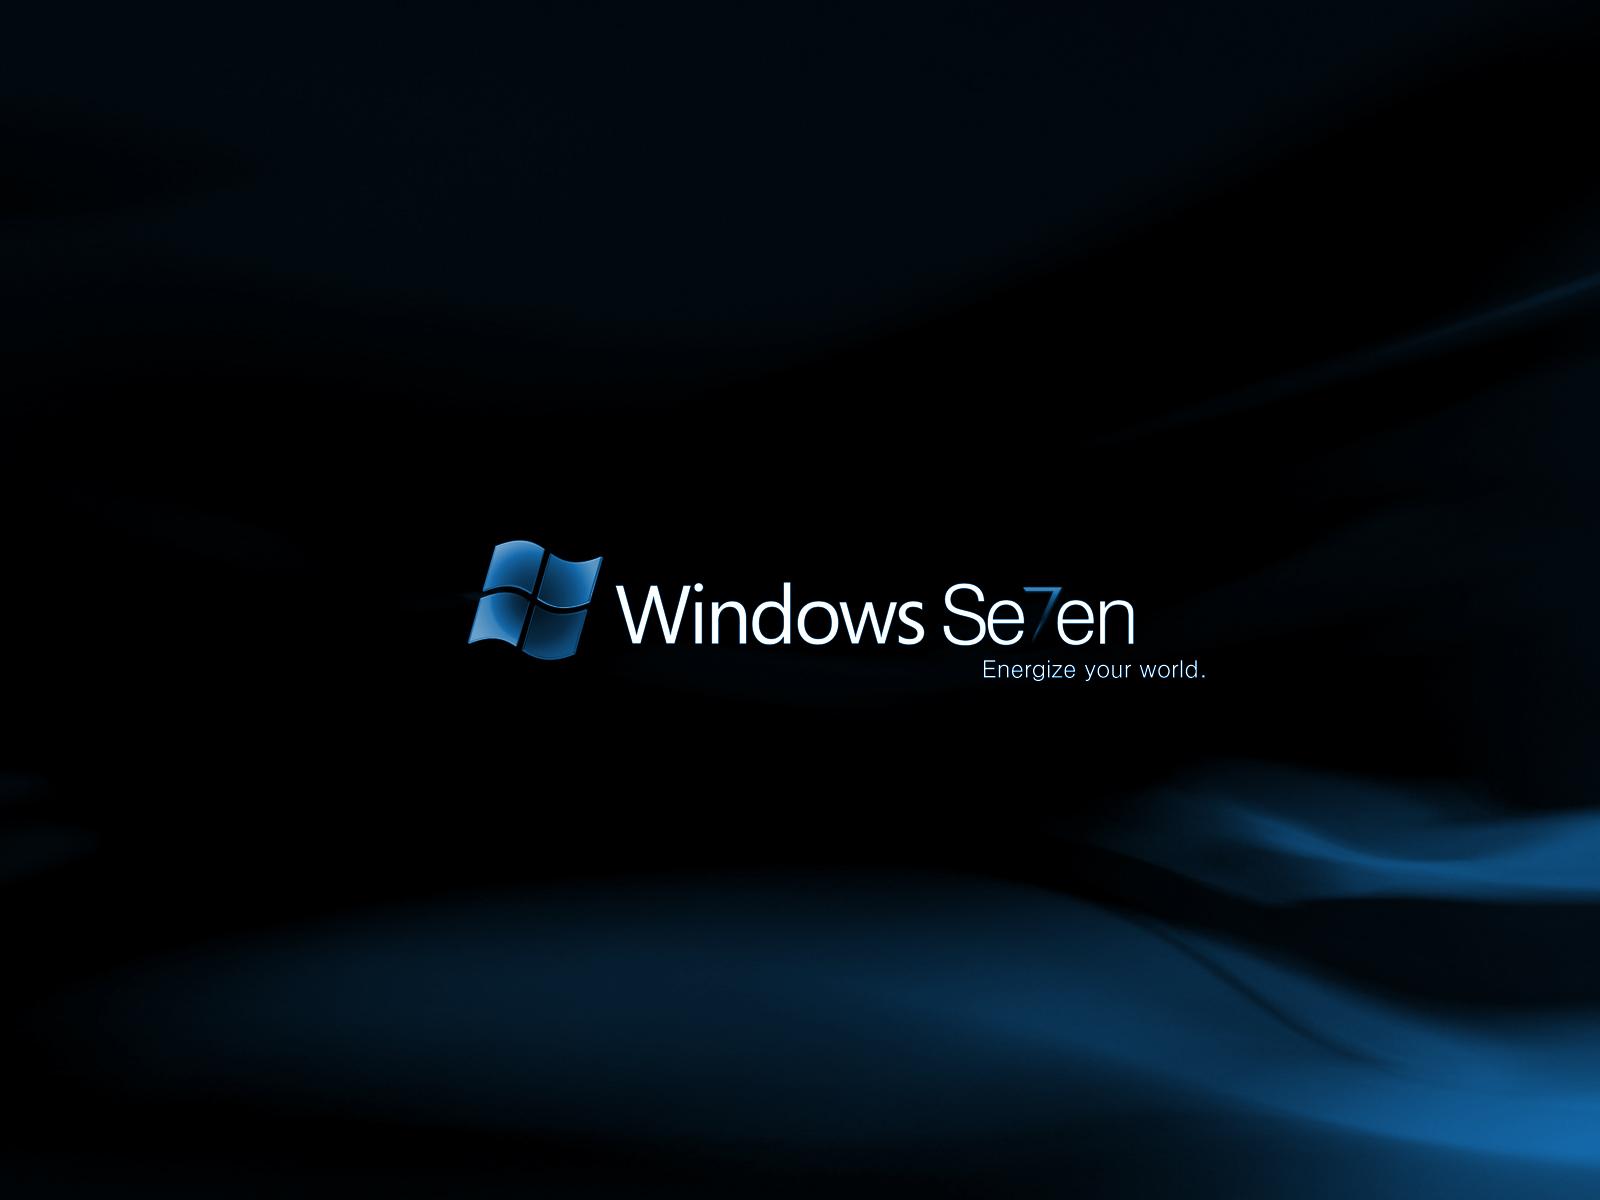 http://1.bp.blogspot.com/-aPBHAIOSCQc/TjhARR5R9ZI/AAAAAAAAAIk/sJE6jz73SQo/s1600/windows-7-wallpaper-2.jpg